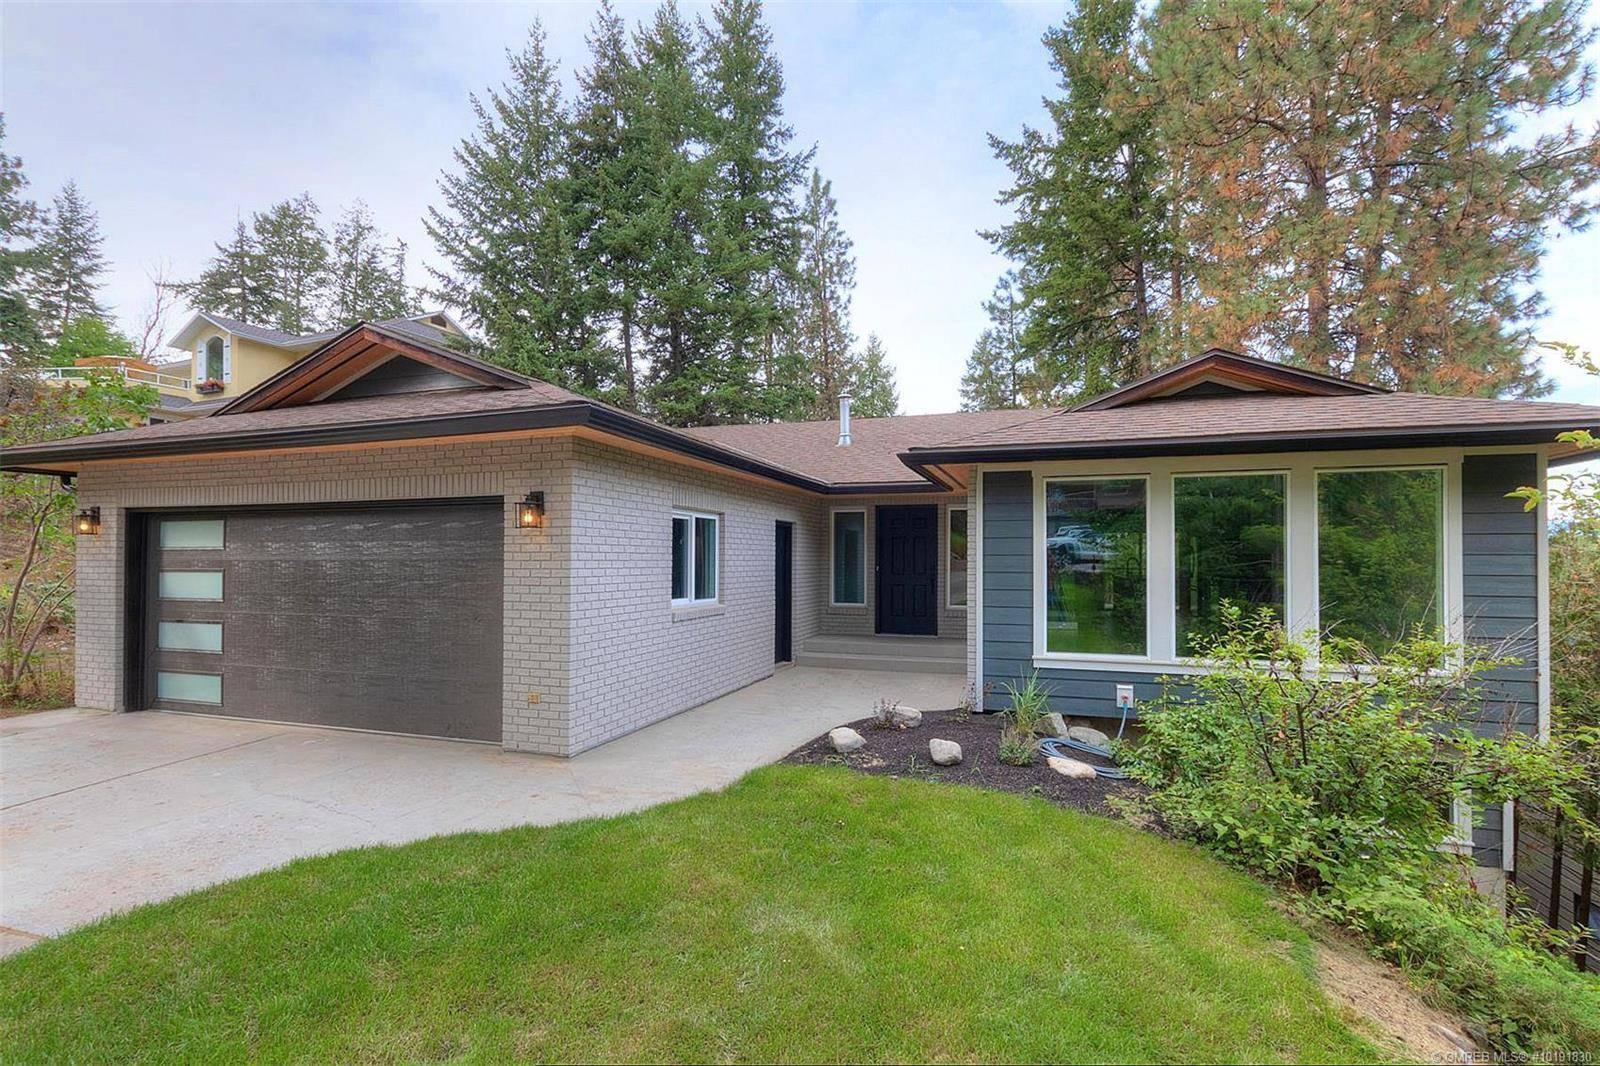 House for sale at 600 Thorneloe Rd Kelowna British Columbia - MLS: 10191830